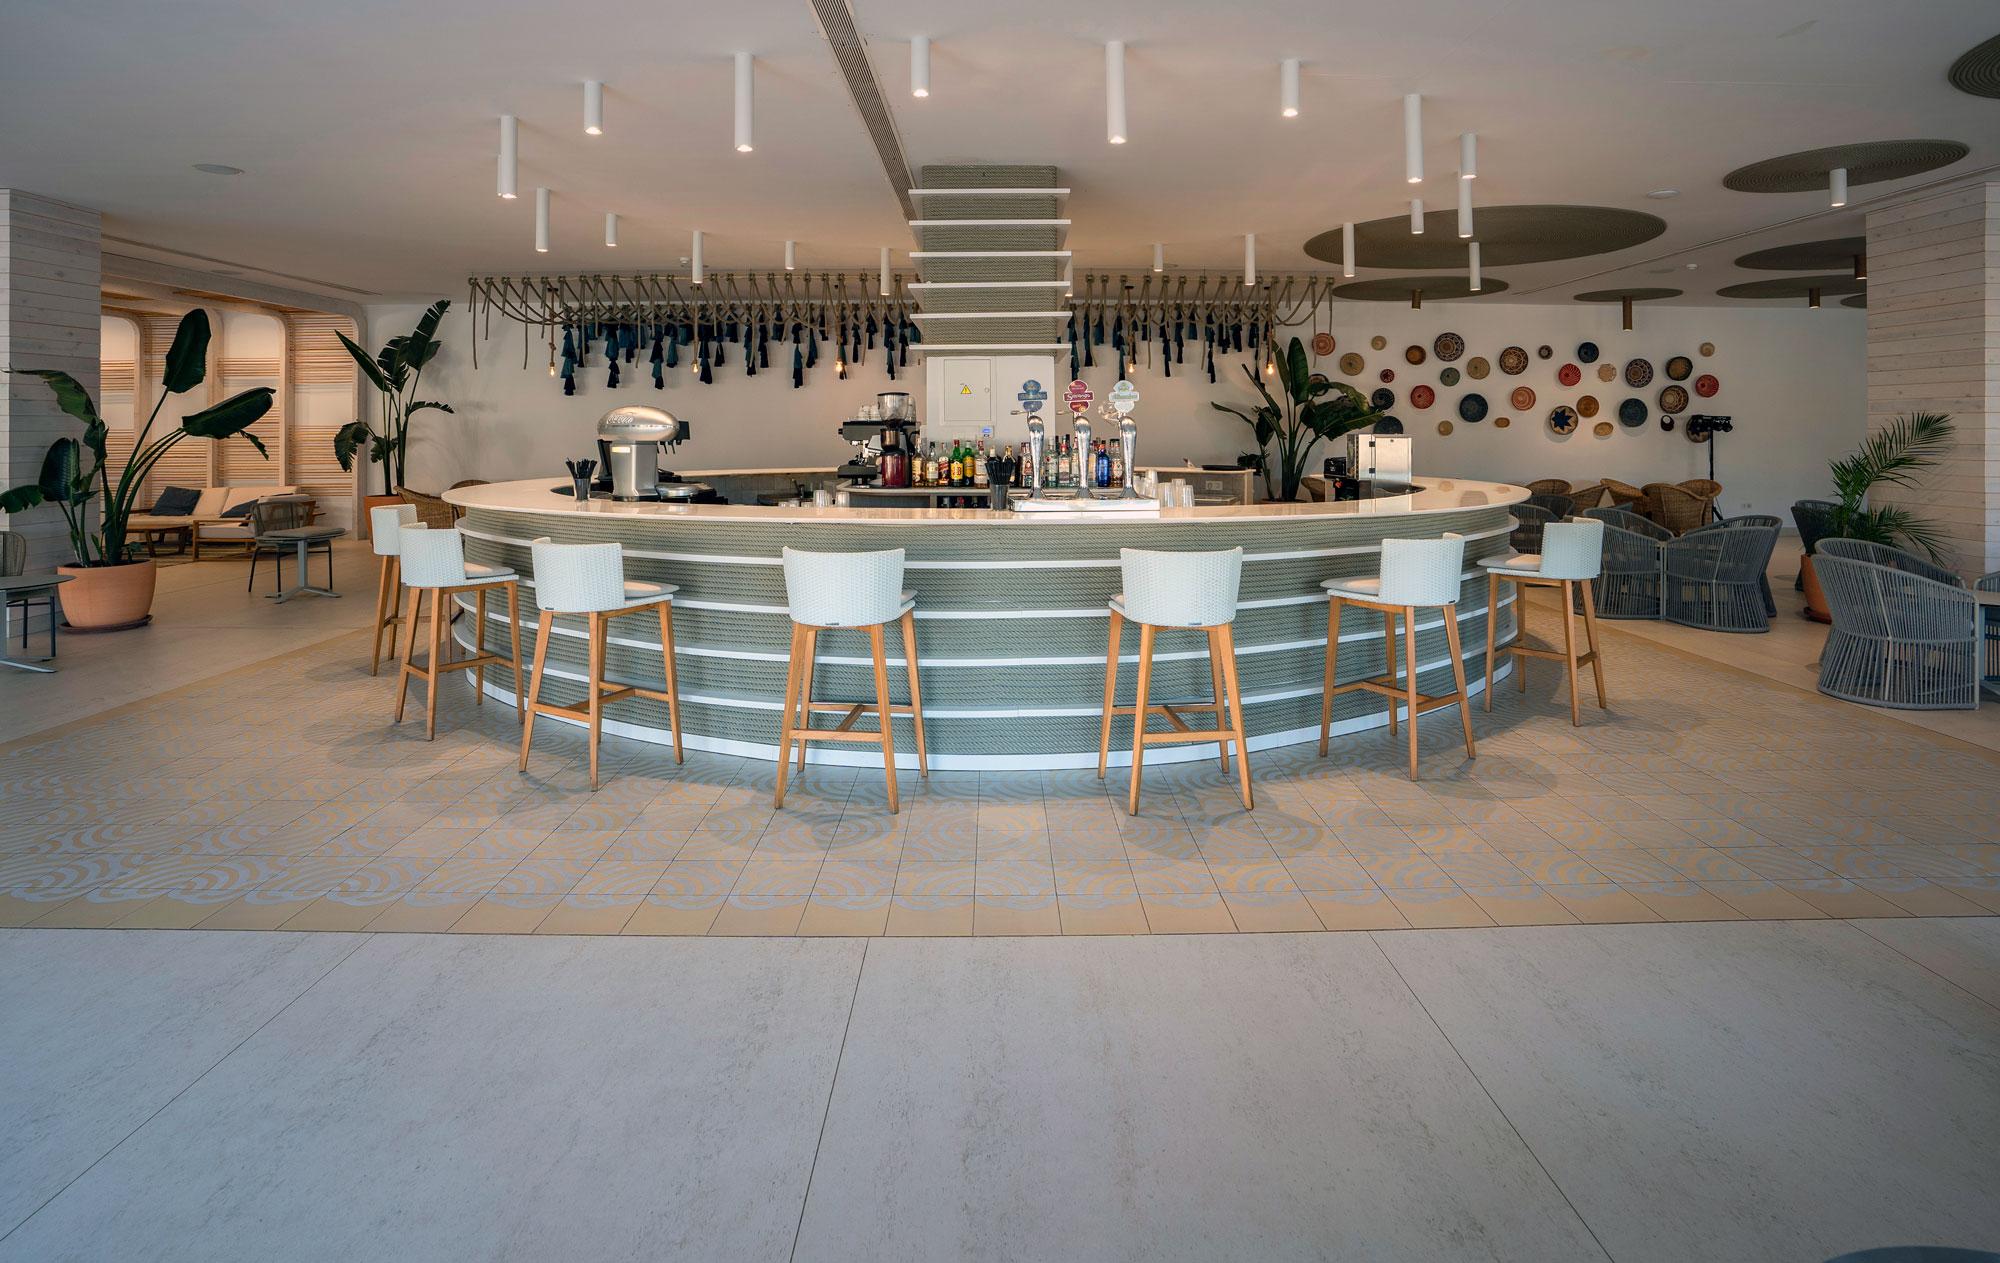 Hotel Mediterráneo  - Hotel Mediterraneo Park 7 Dekton Silestone Piedra Natural Cosentino 55